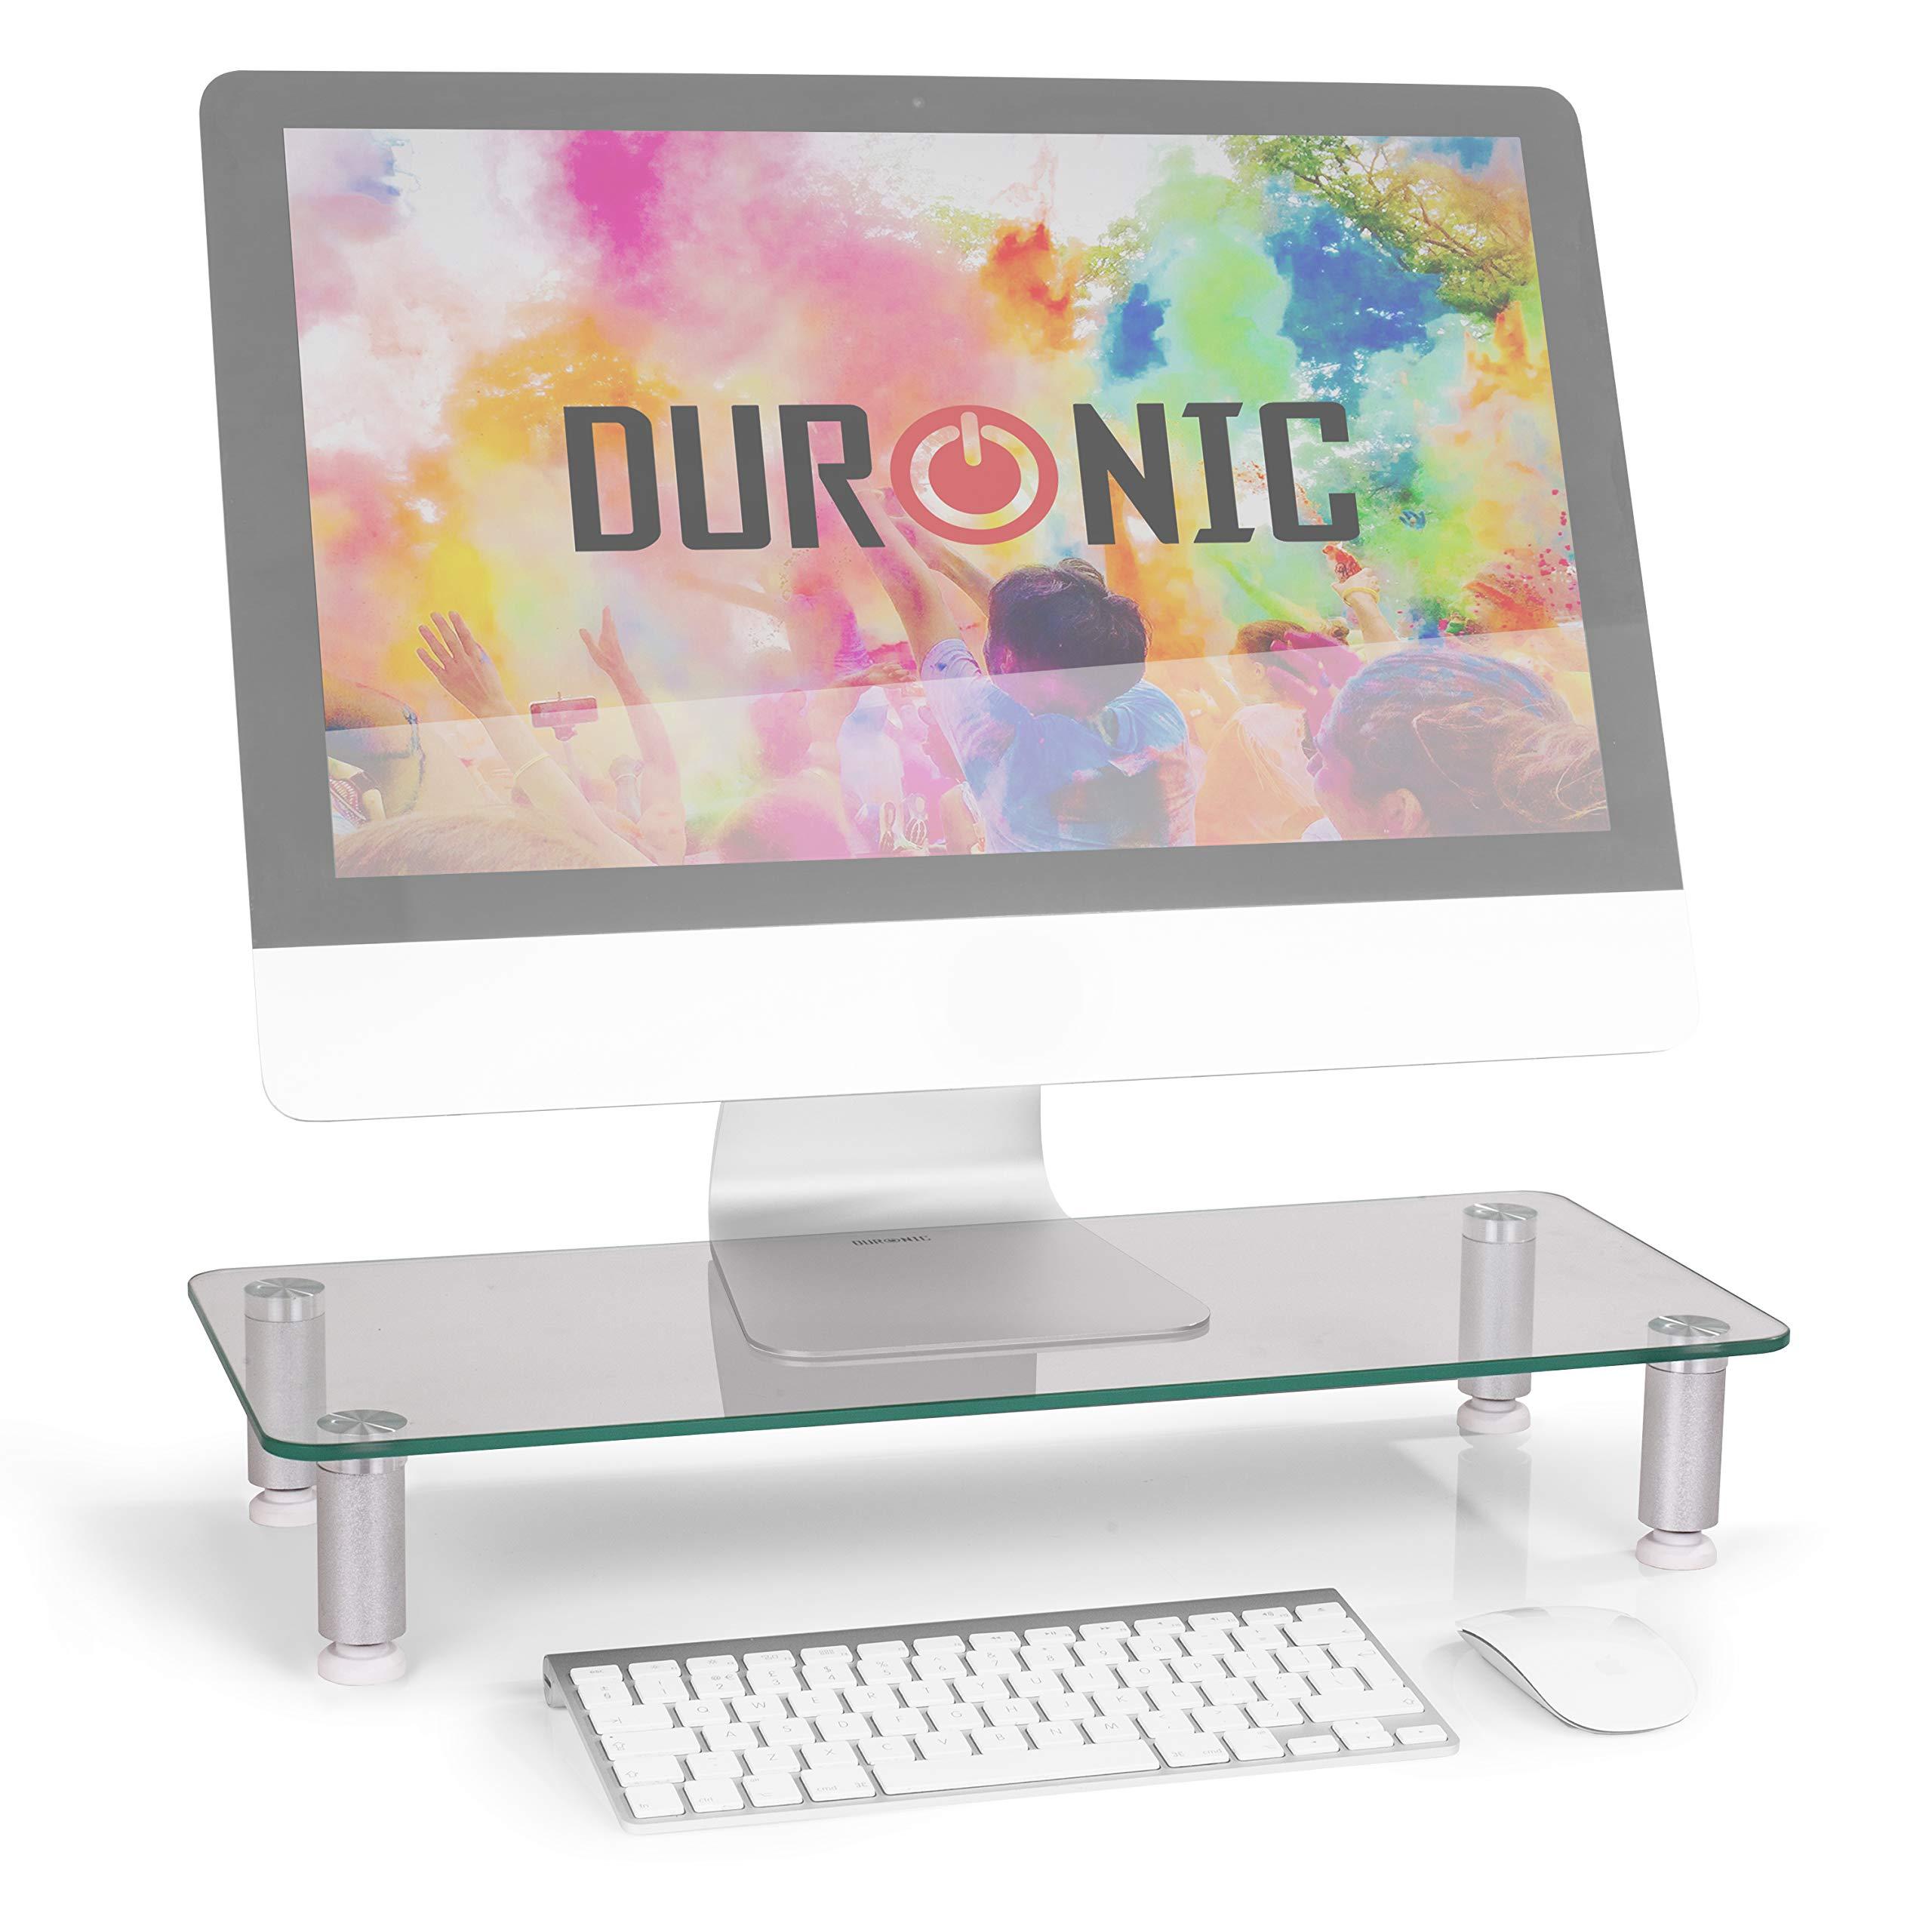 Duronic DM052-1 Elevador para Pantalla, Ordenador Portátil, Televisor: Amazon.es: Electrónica